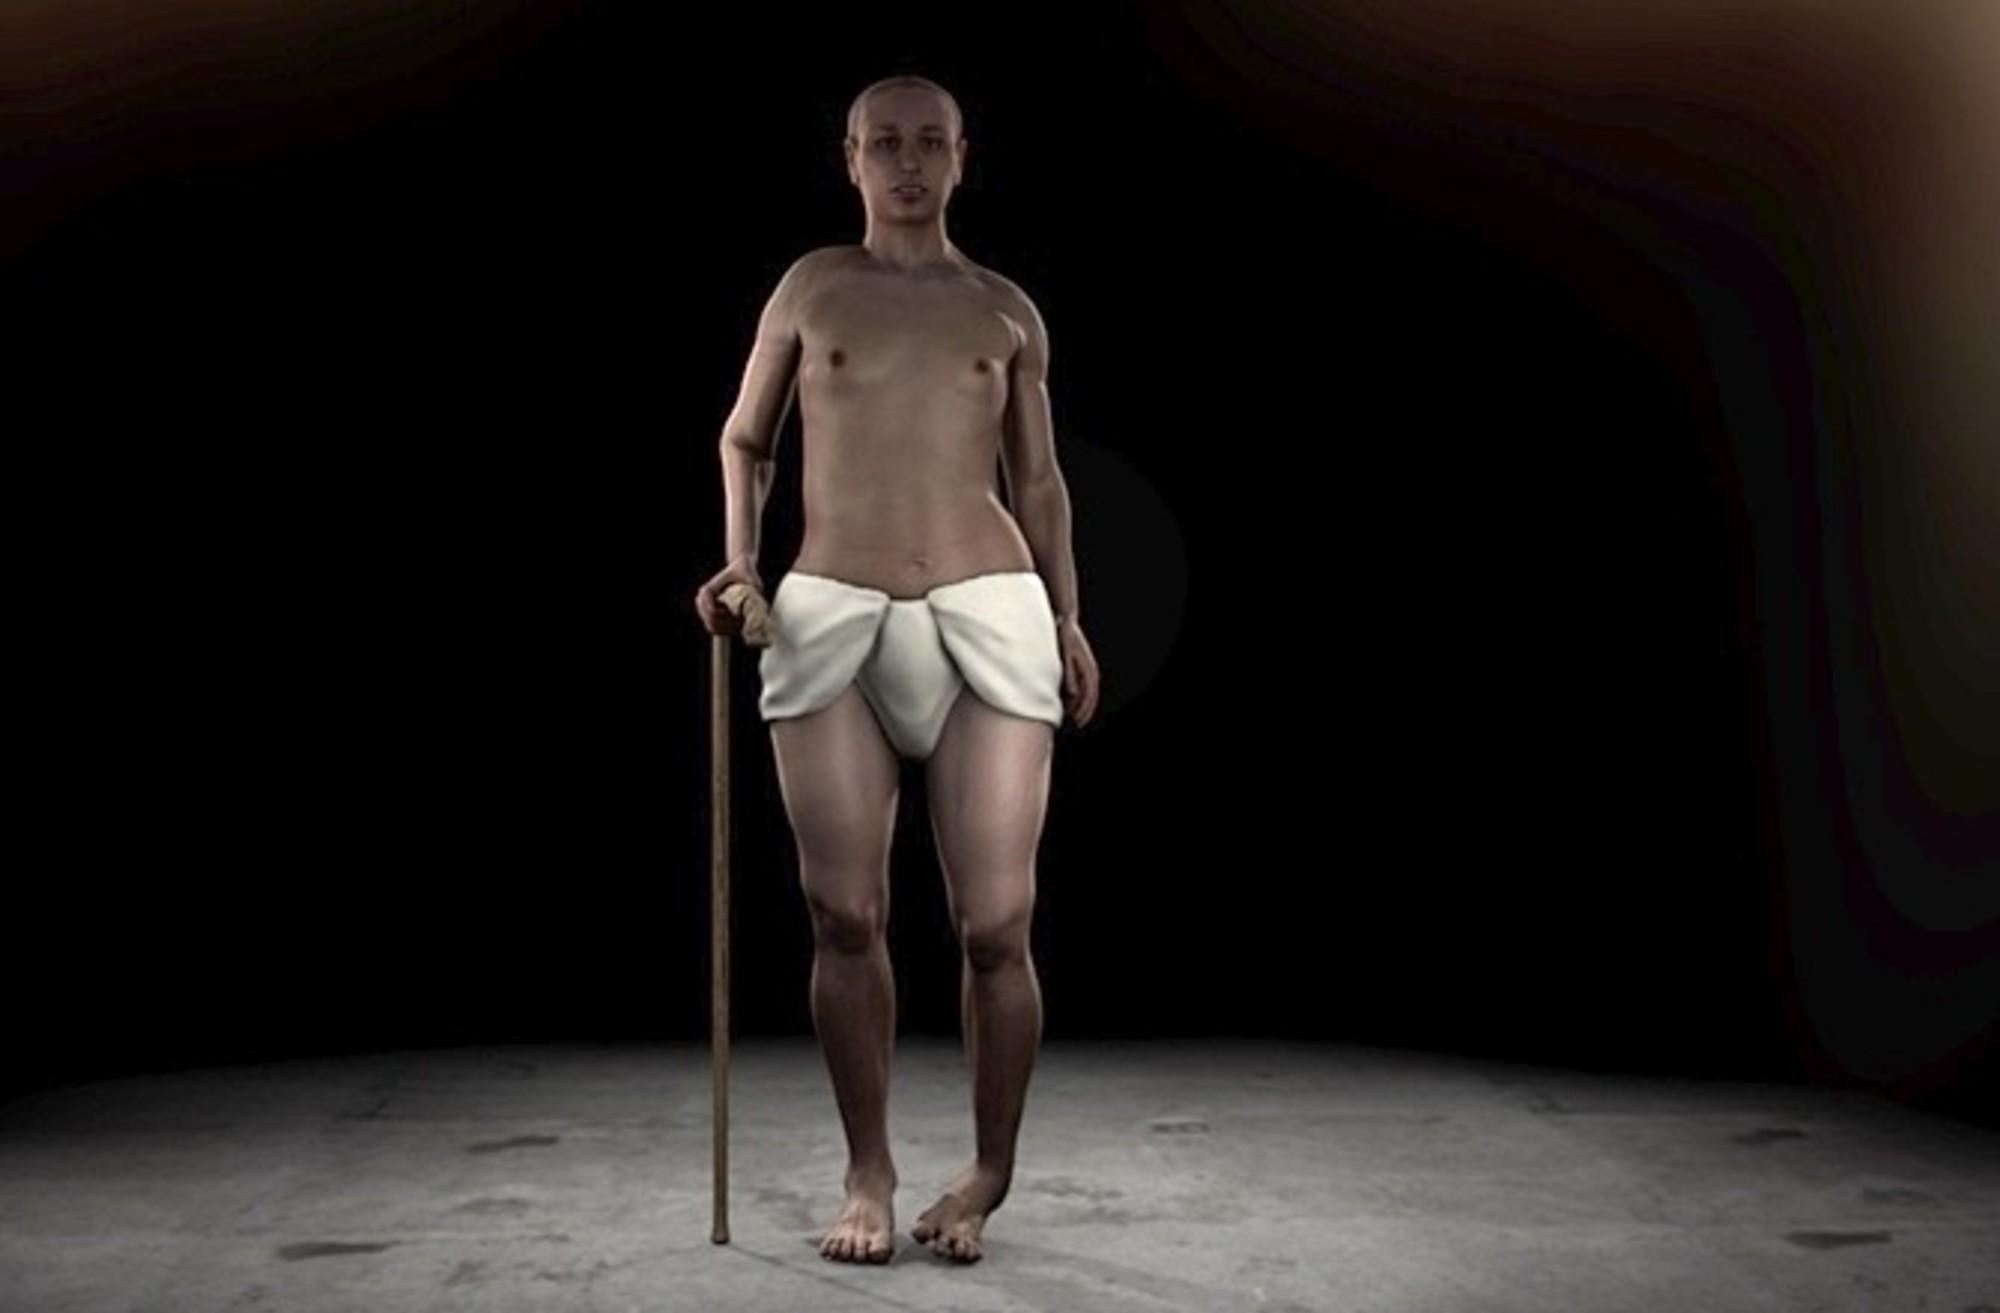 Descubren que Tutankamon tenía «cuerpo escombro»